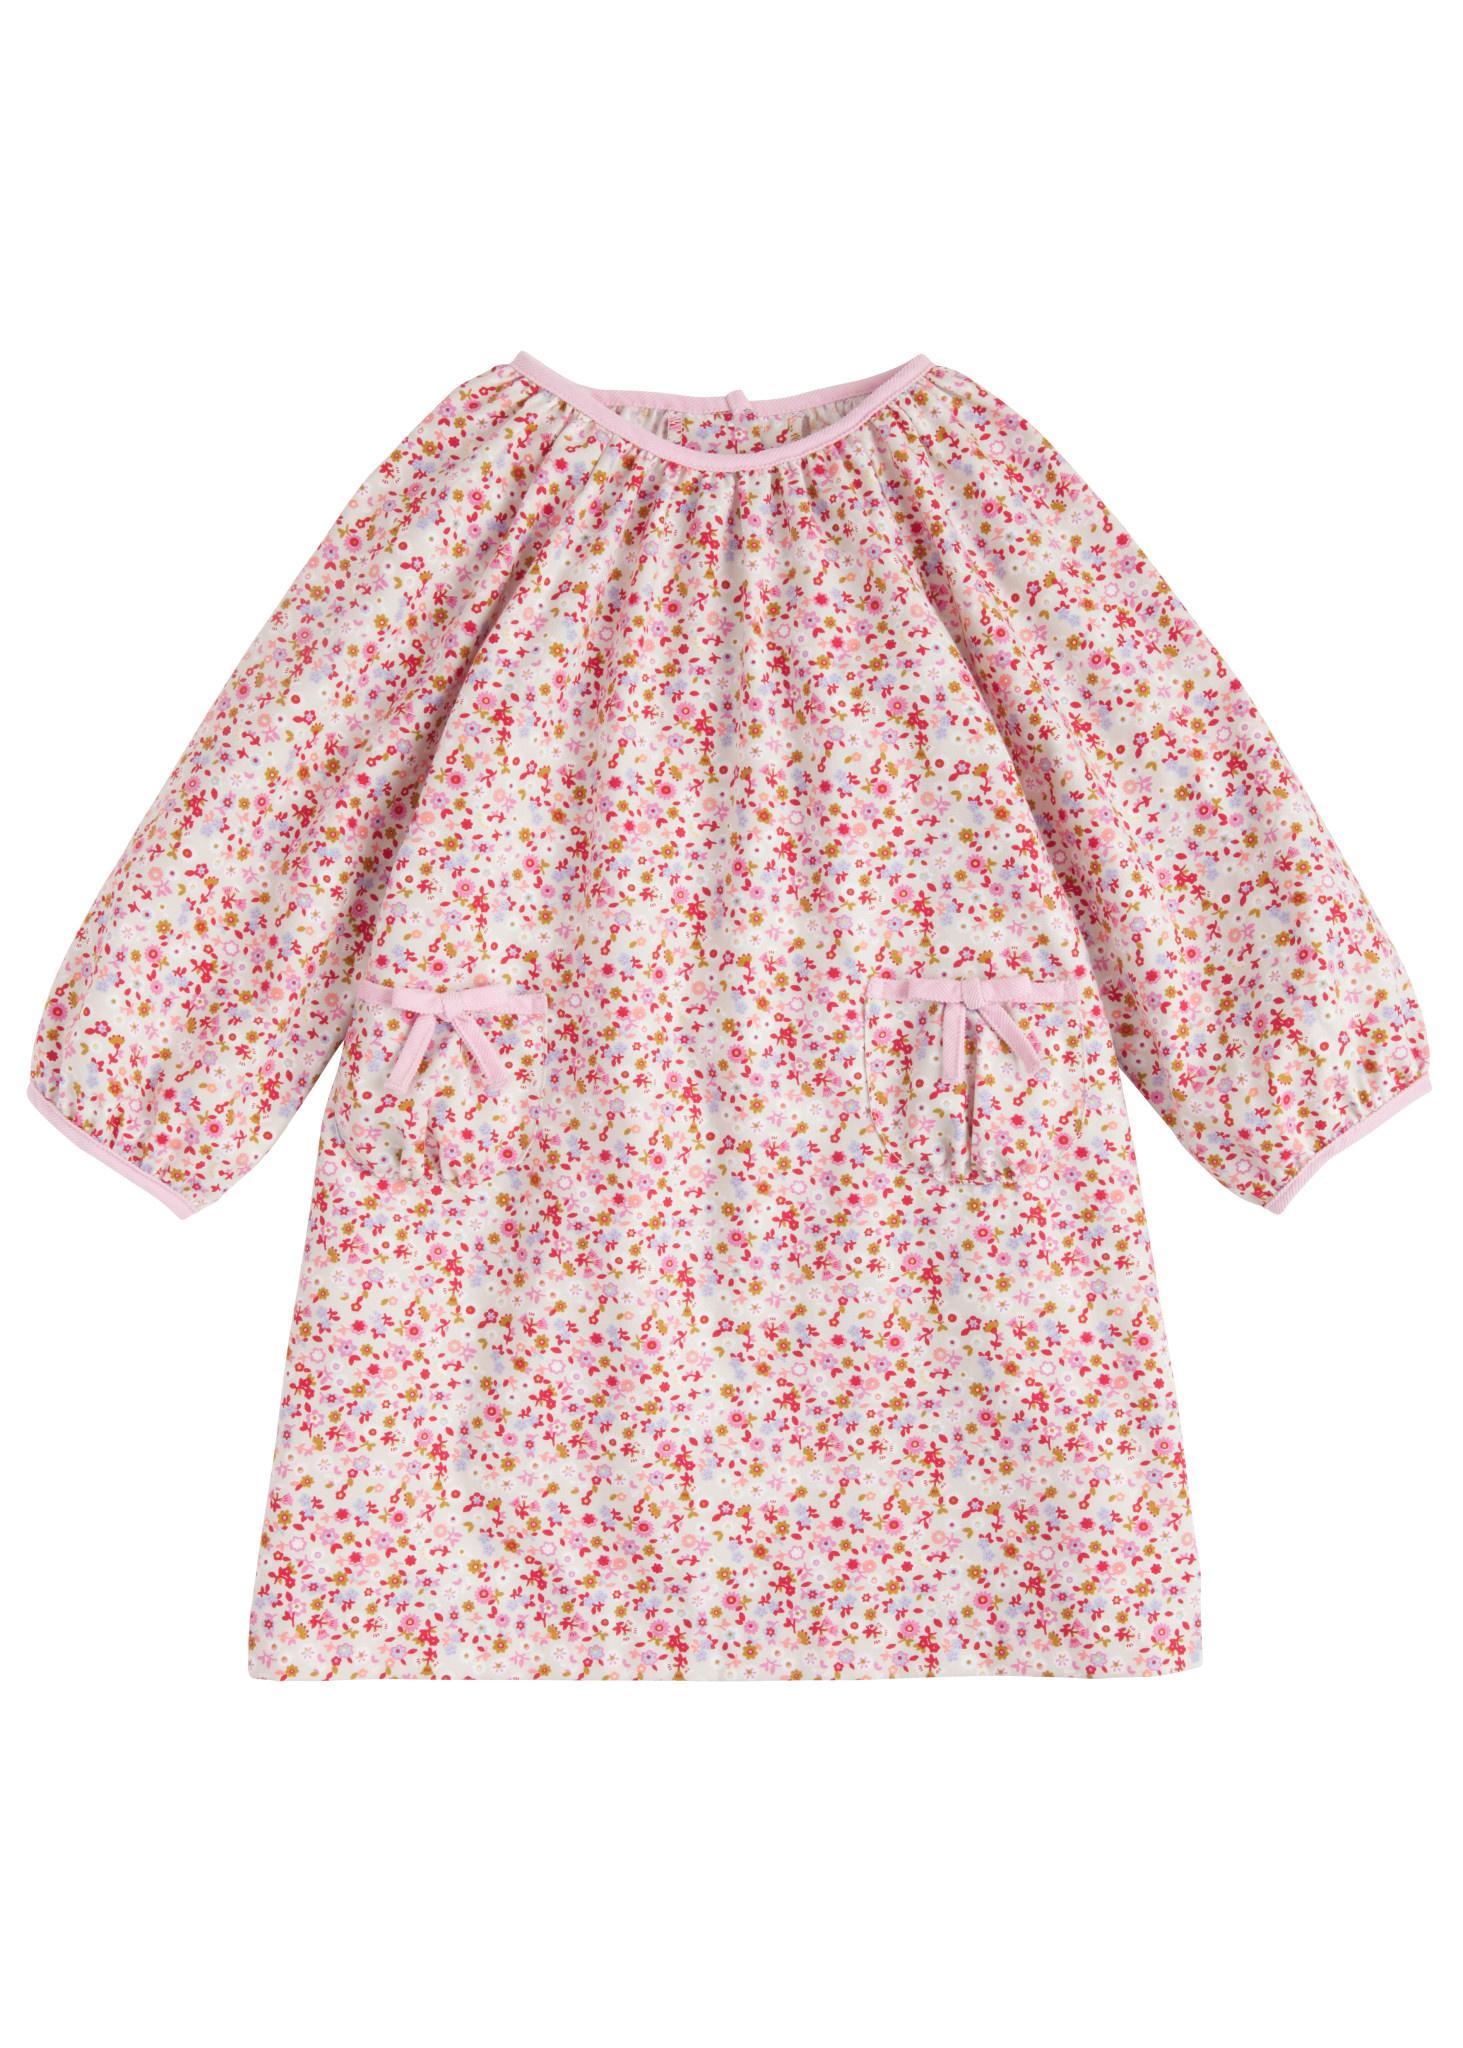 Little English Daphne Floral Dress